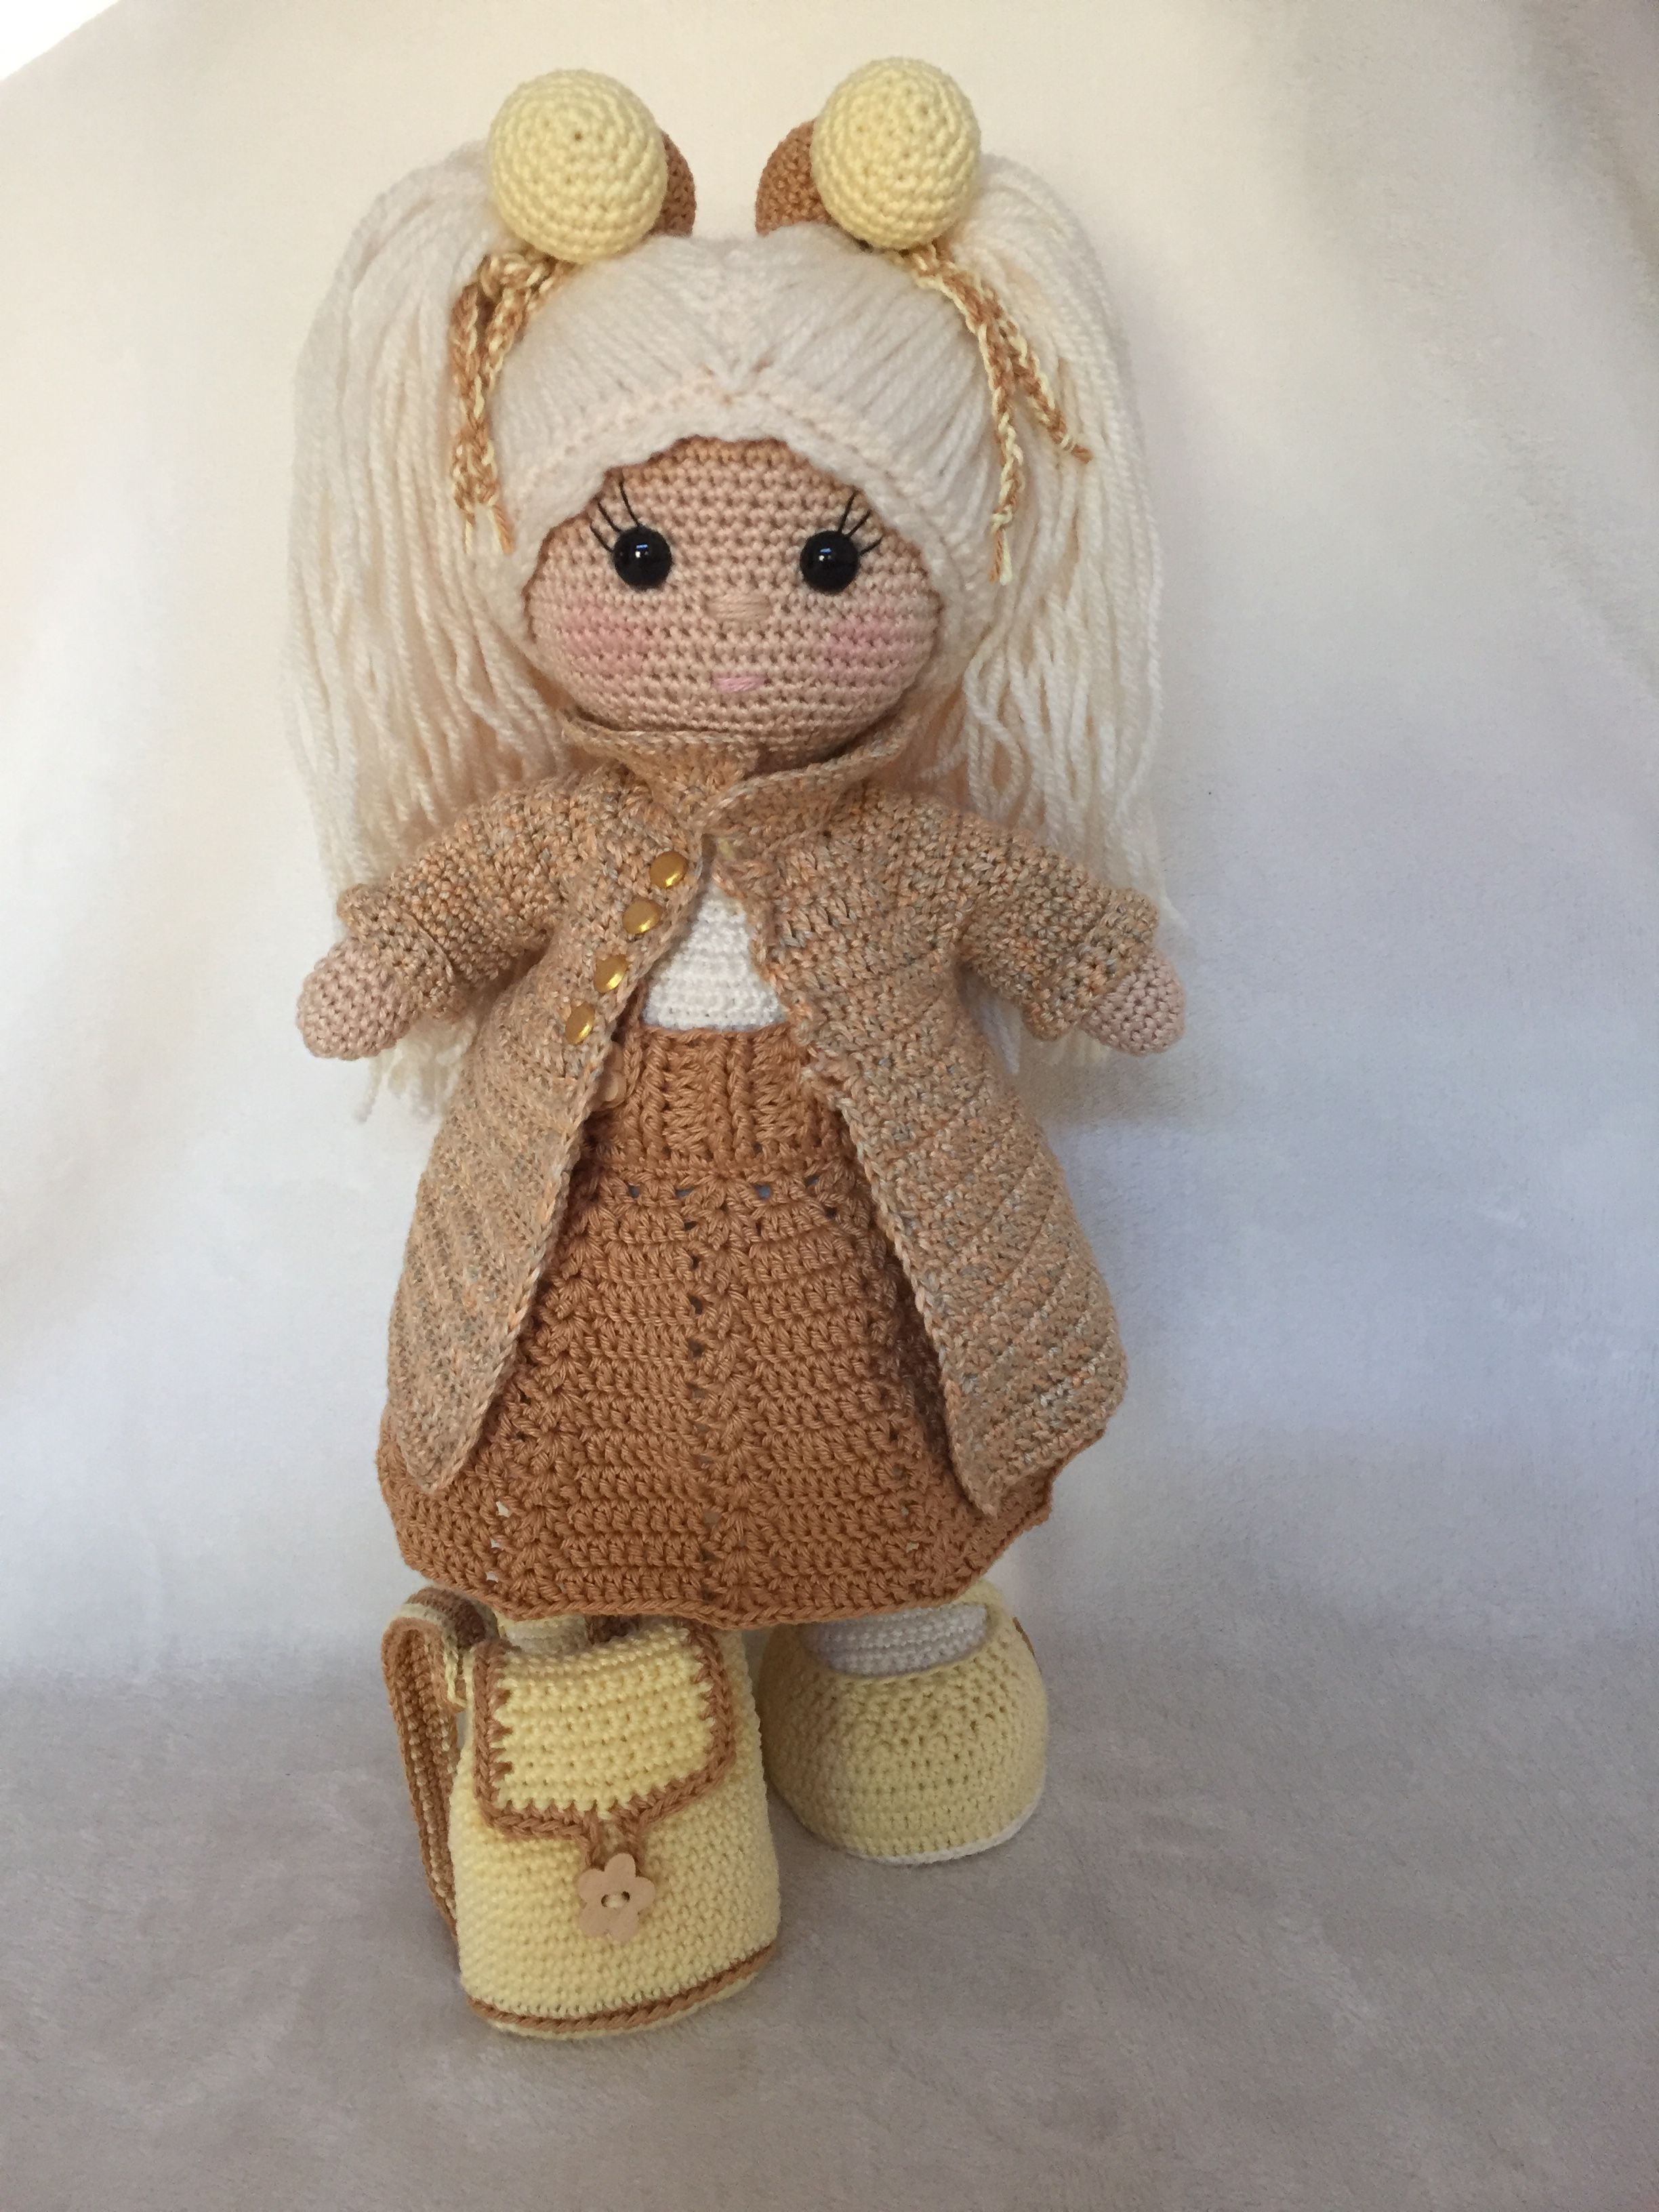 Crochet Hello Kitty Amigurumi Free Patterns - Toy Plush for Kids ... | 3264x2448